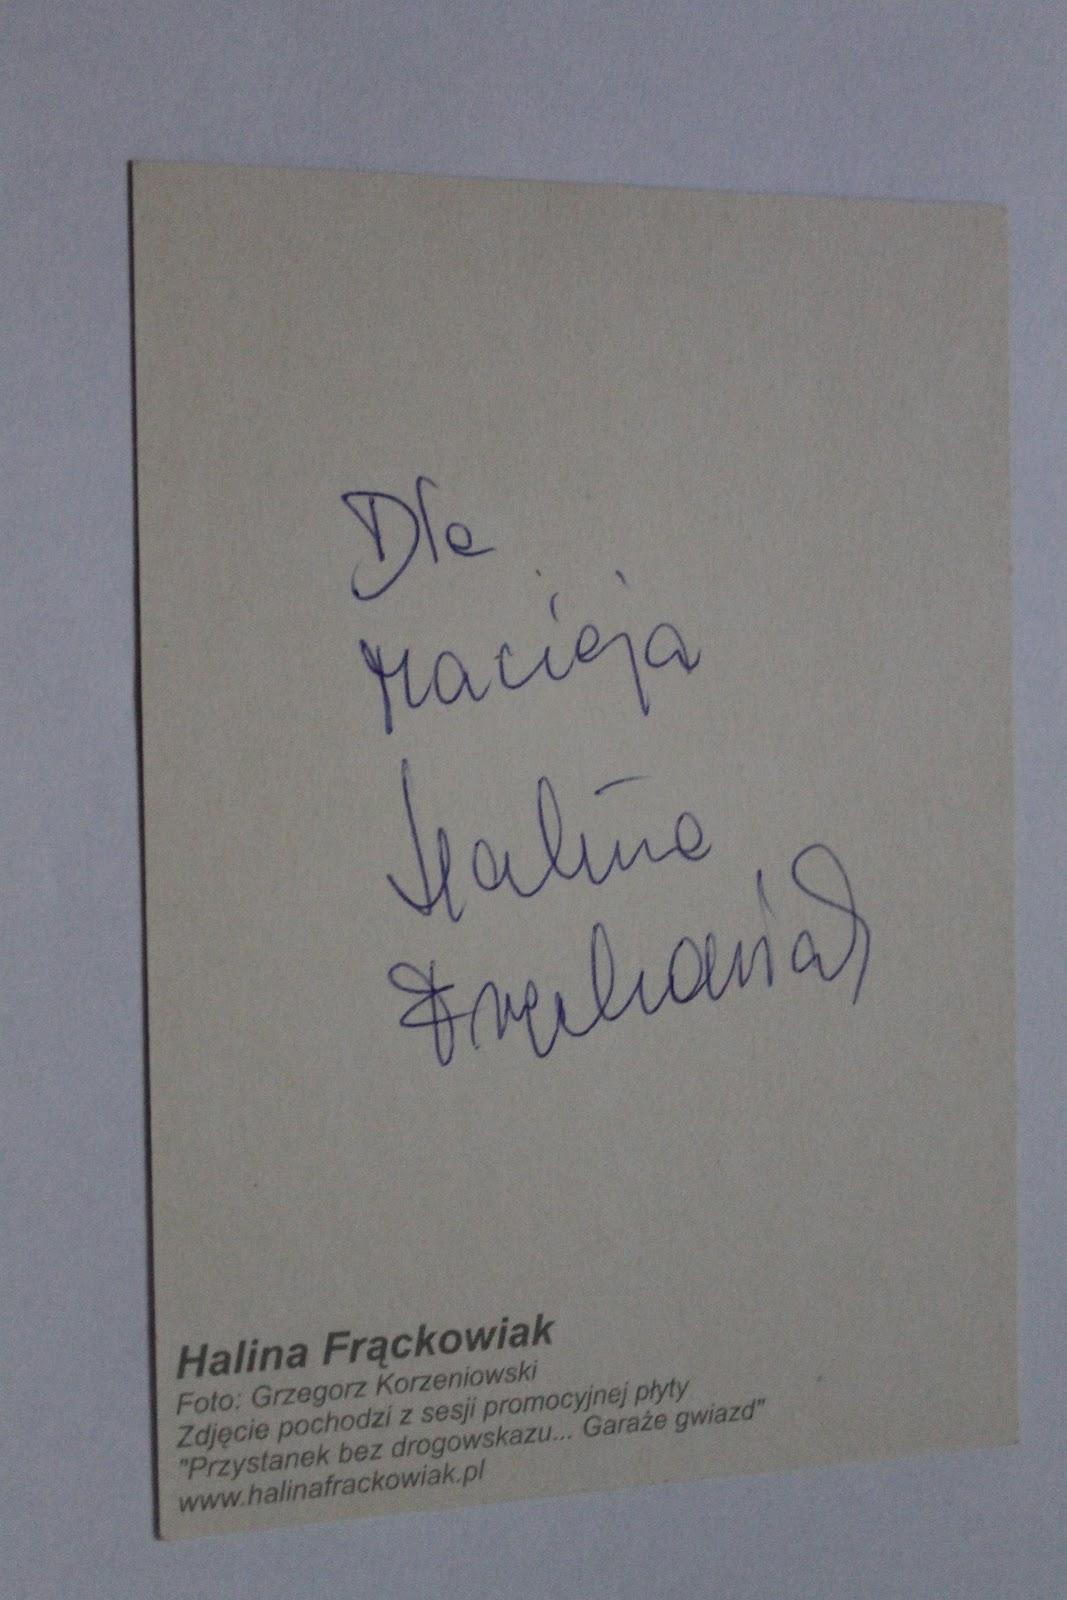 Autografy Macka Macderer Halina Frackowiak